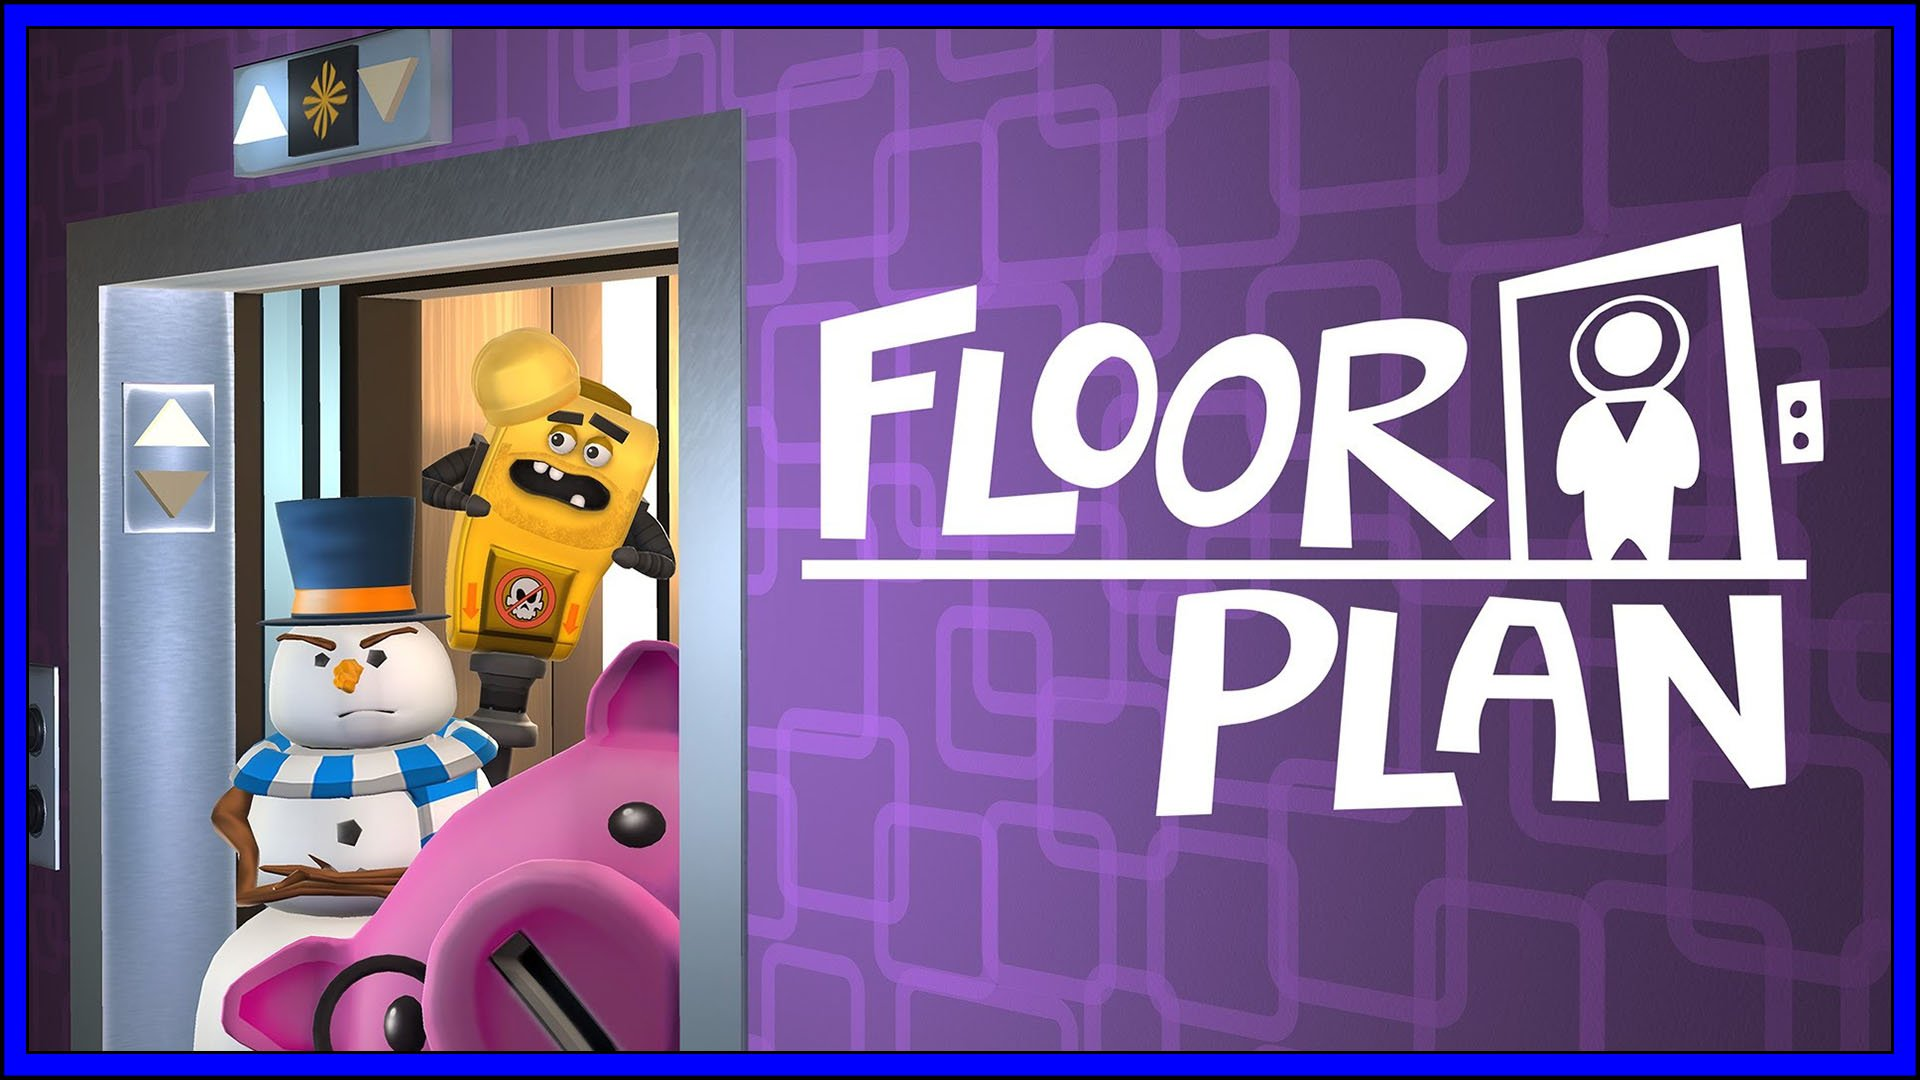 Floor Plan Fi3